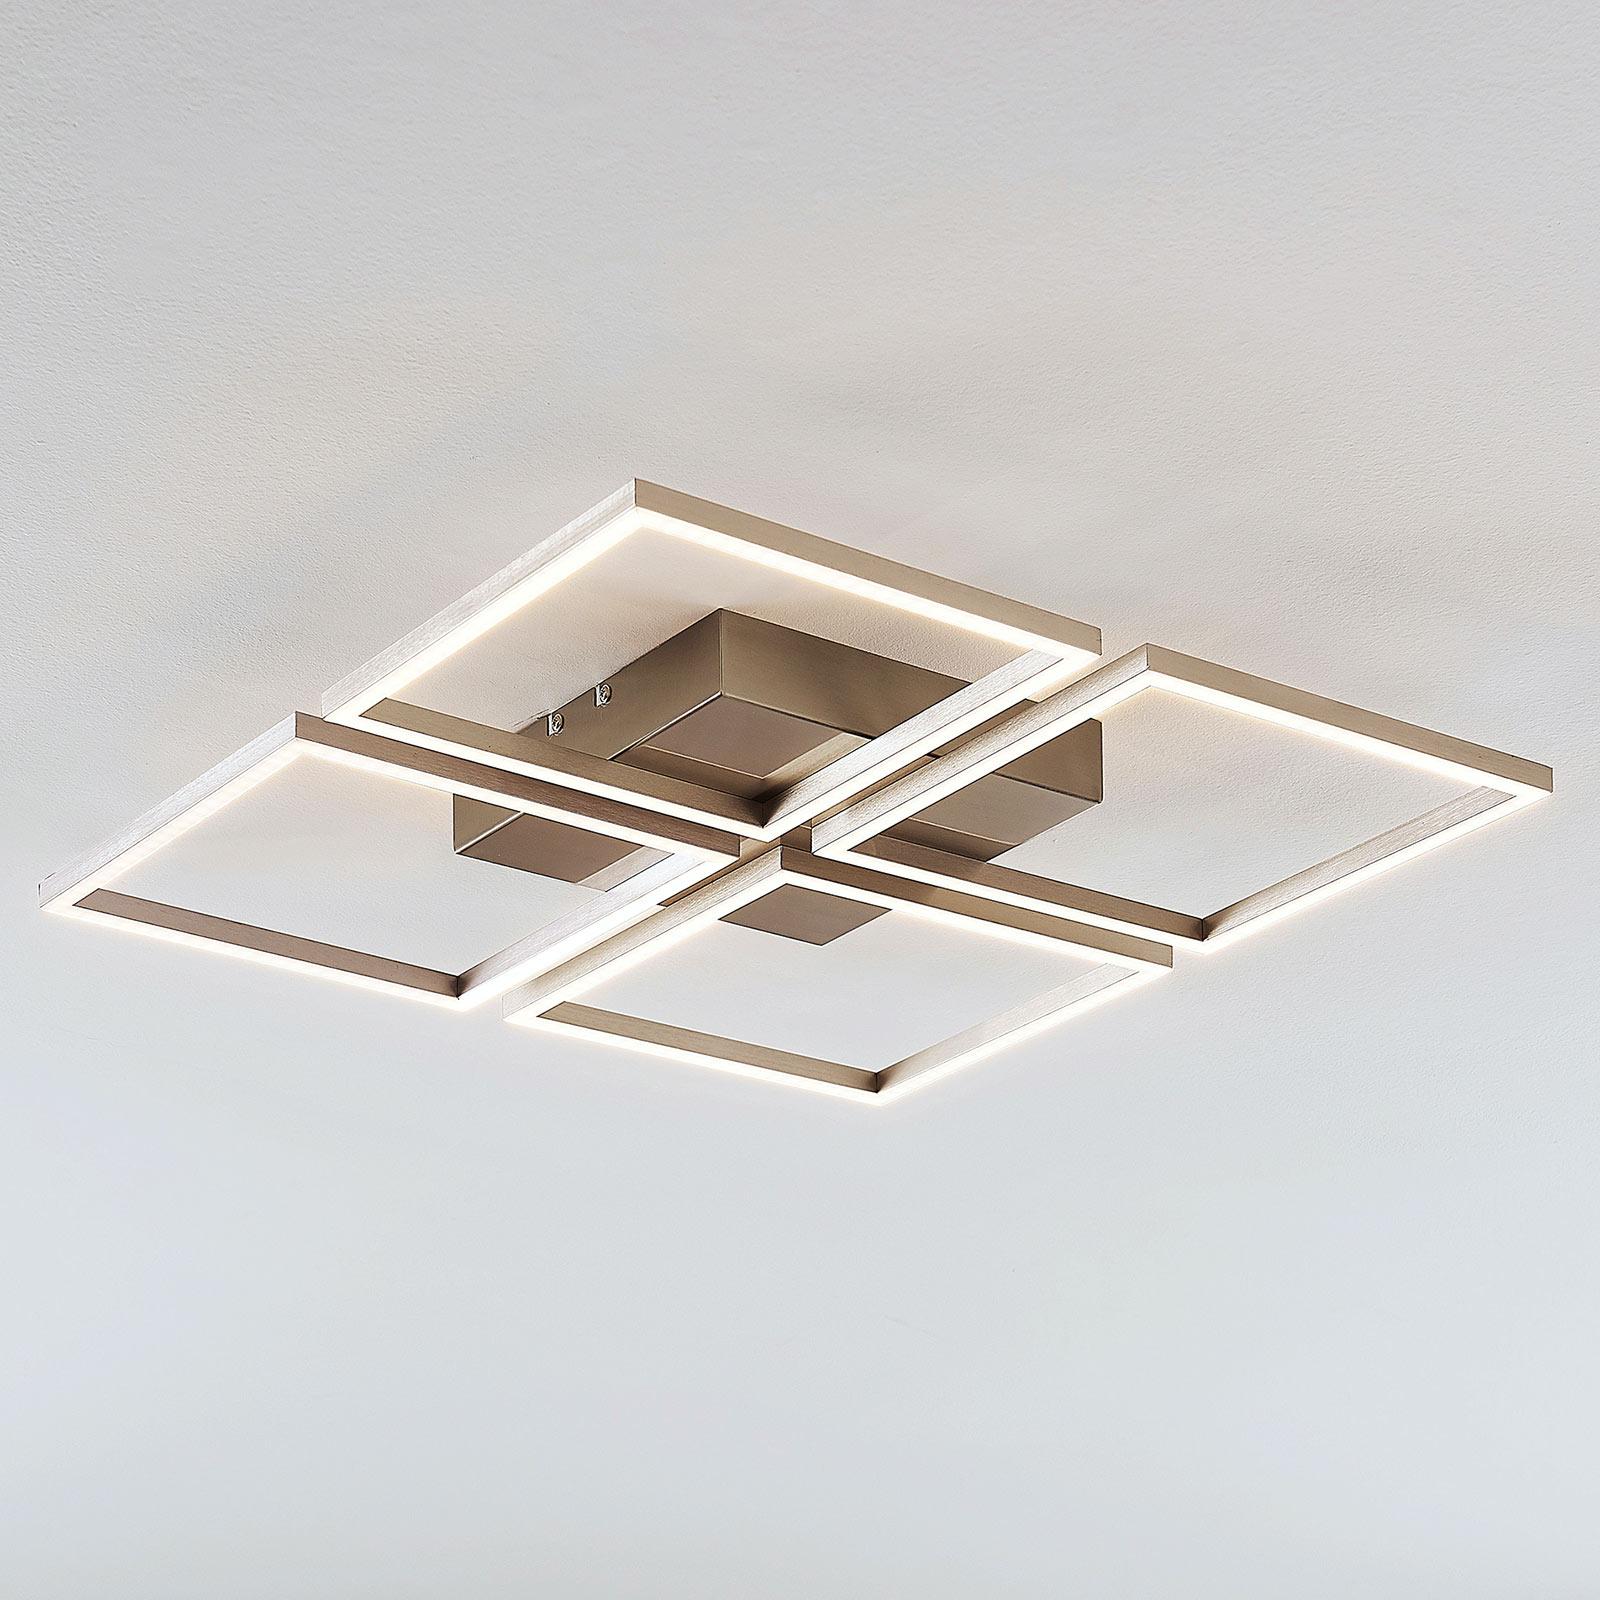 Plafonnier LED Quadra, dimmable, 4 lampes, 52,5cm